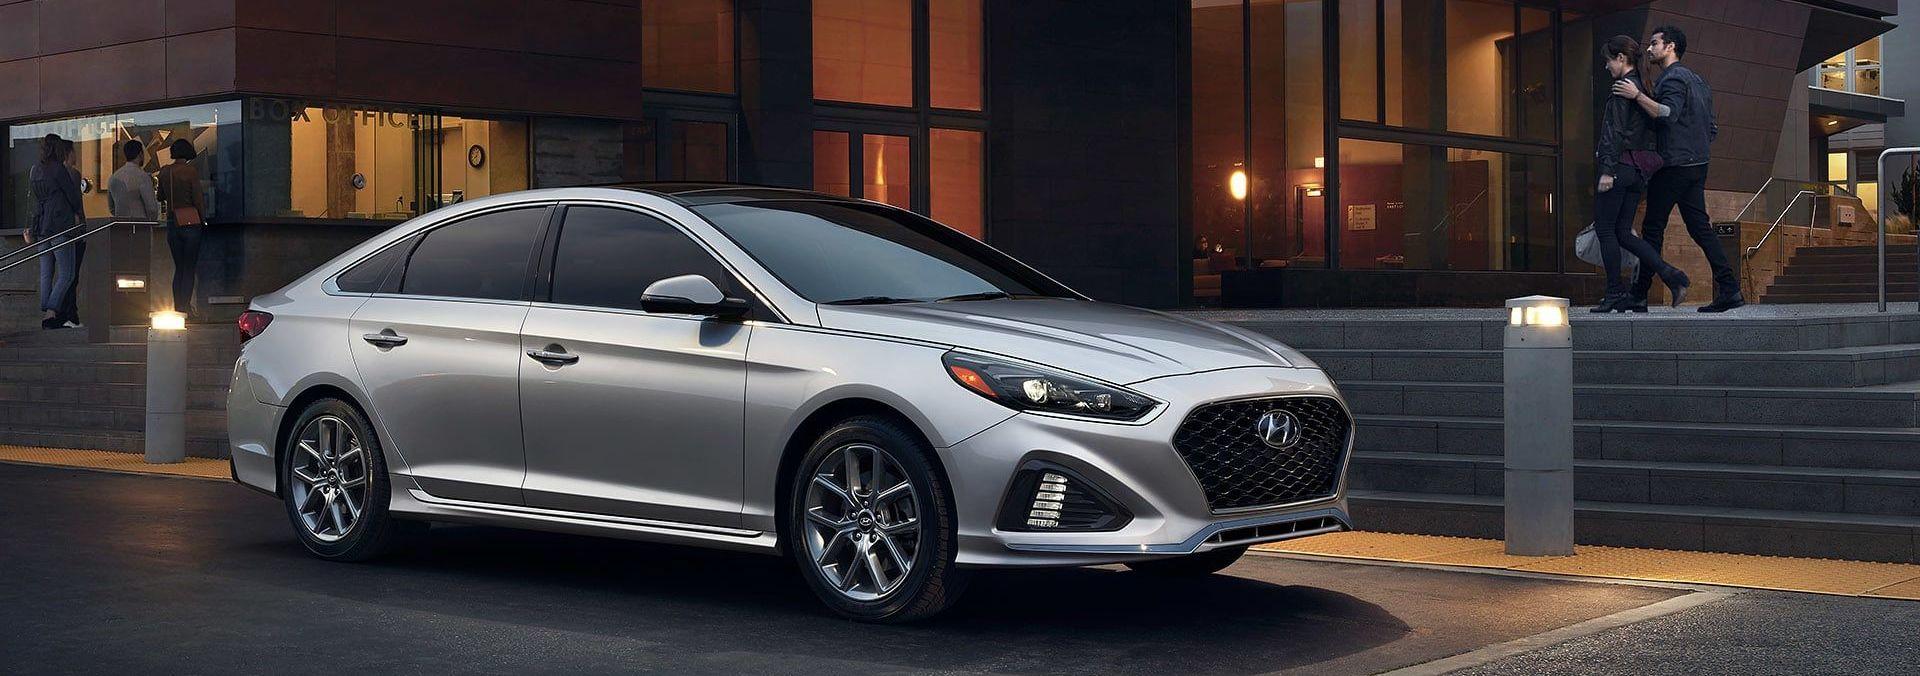 Used Hyundai Vehicles for Sale near Joliet, IL